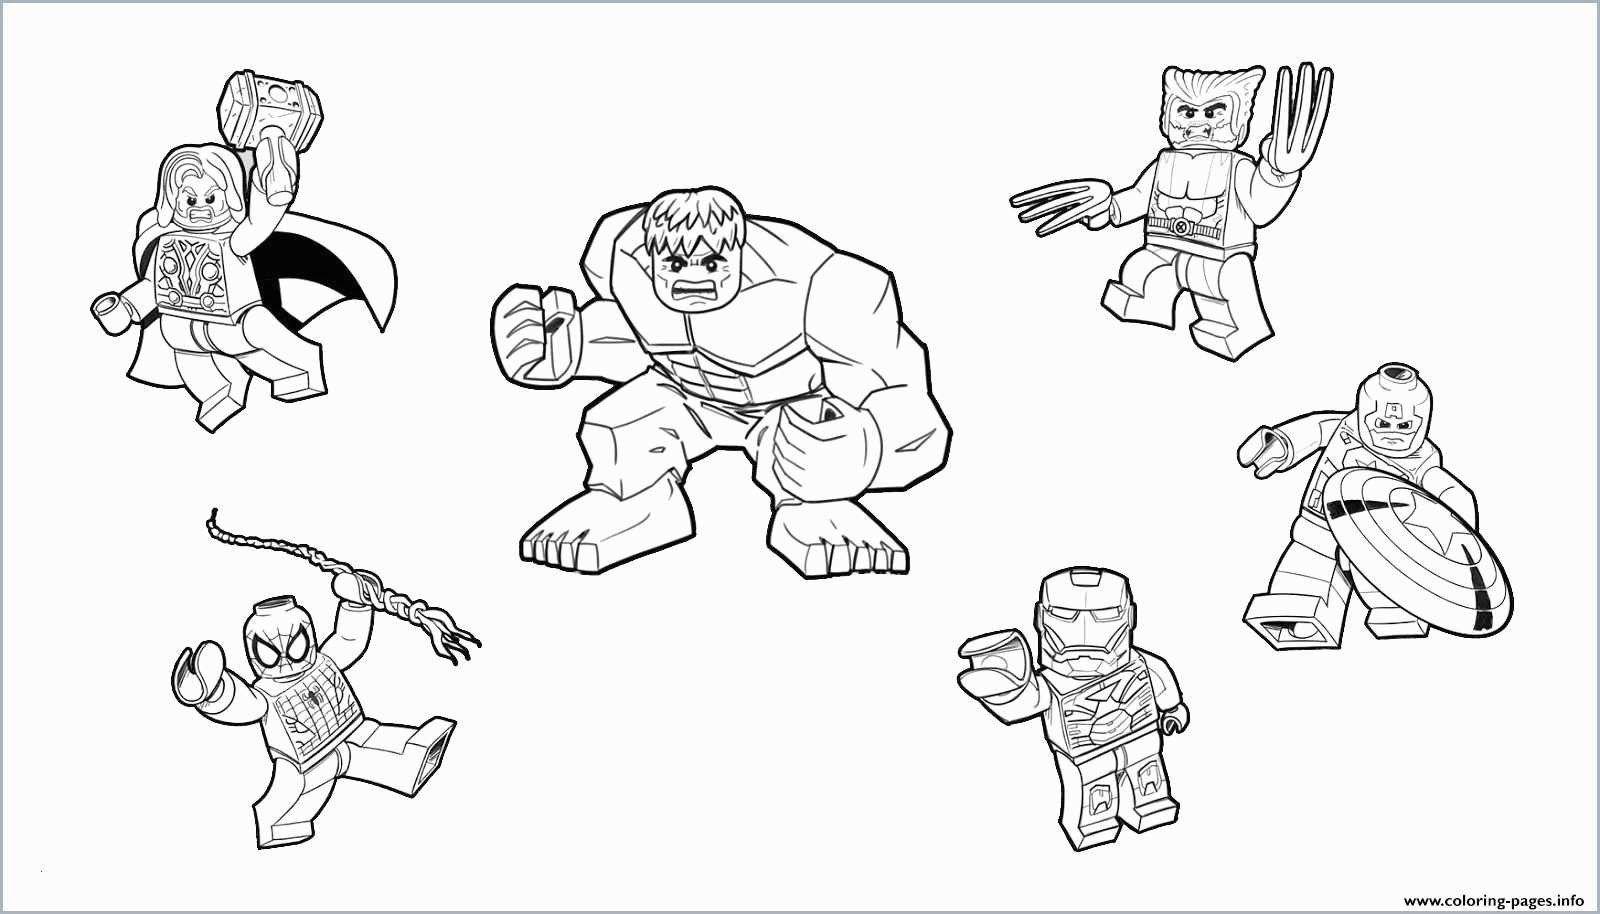 Lego Superhero Coloring Pages New Ausmalbild Iron Man Einzigartig 33 Elegant Iron Man In 2020 Avengers Coloring Pages Superhero Coloring Superhero Coloring Pages